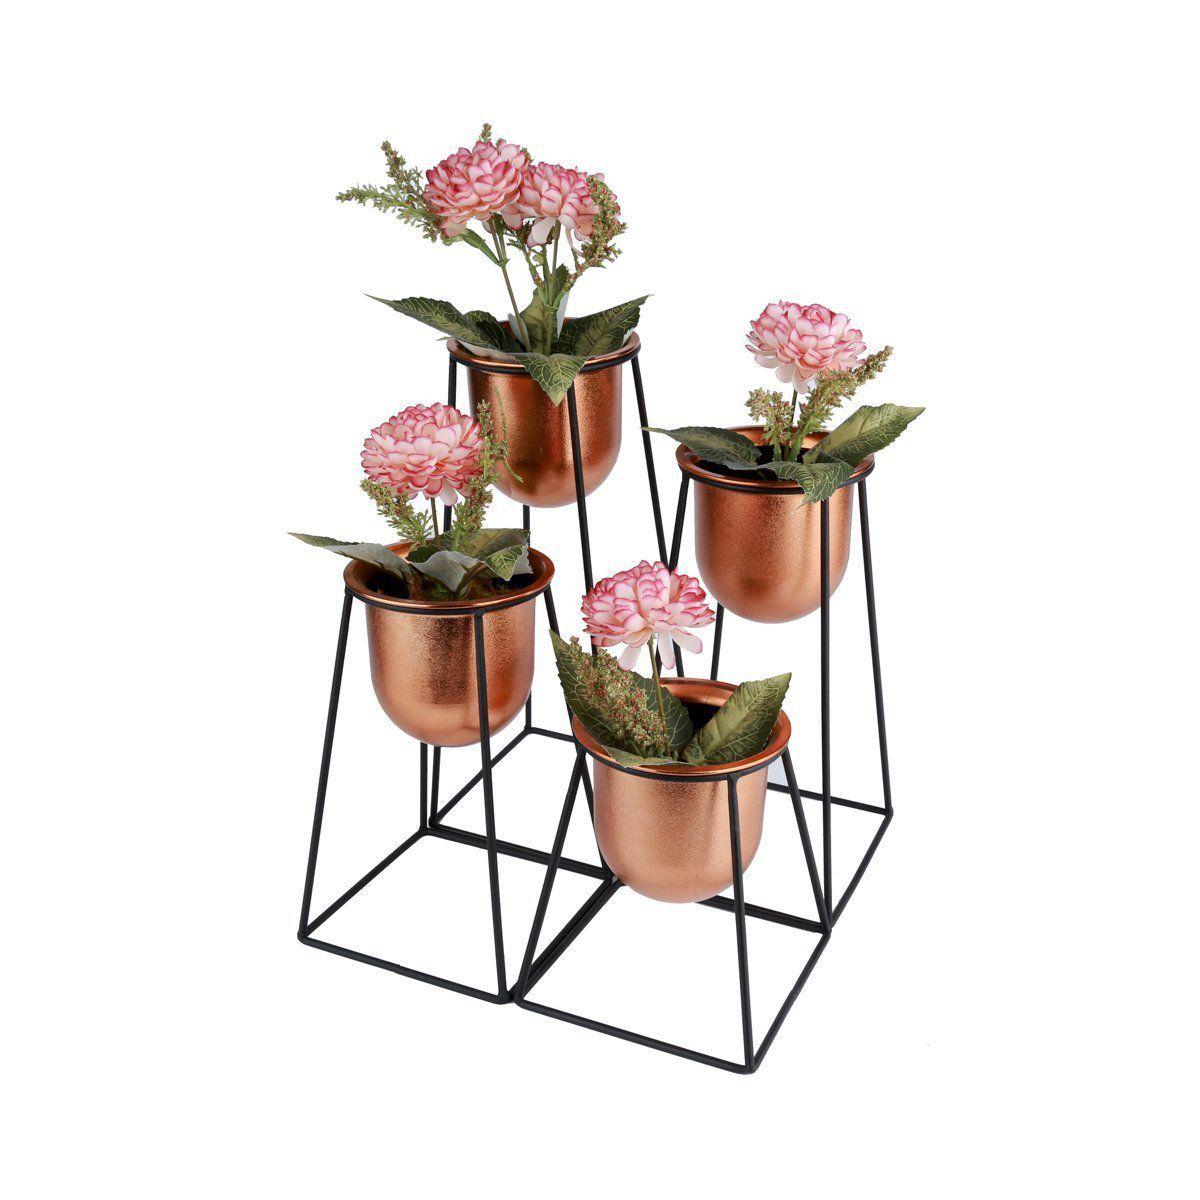 Kit 4 Vasos Geométricos Bronze com Suportes de Metal Pretos - 40076